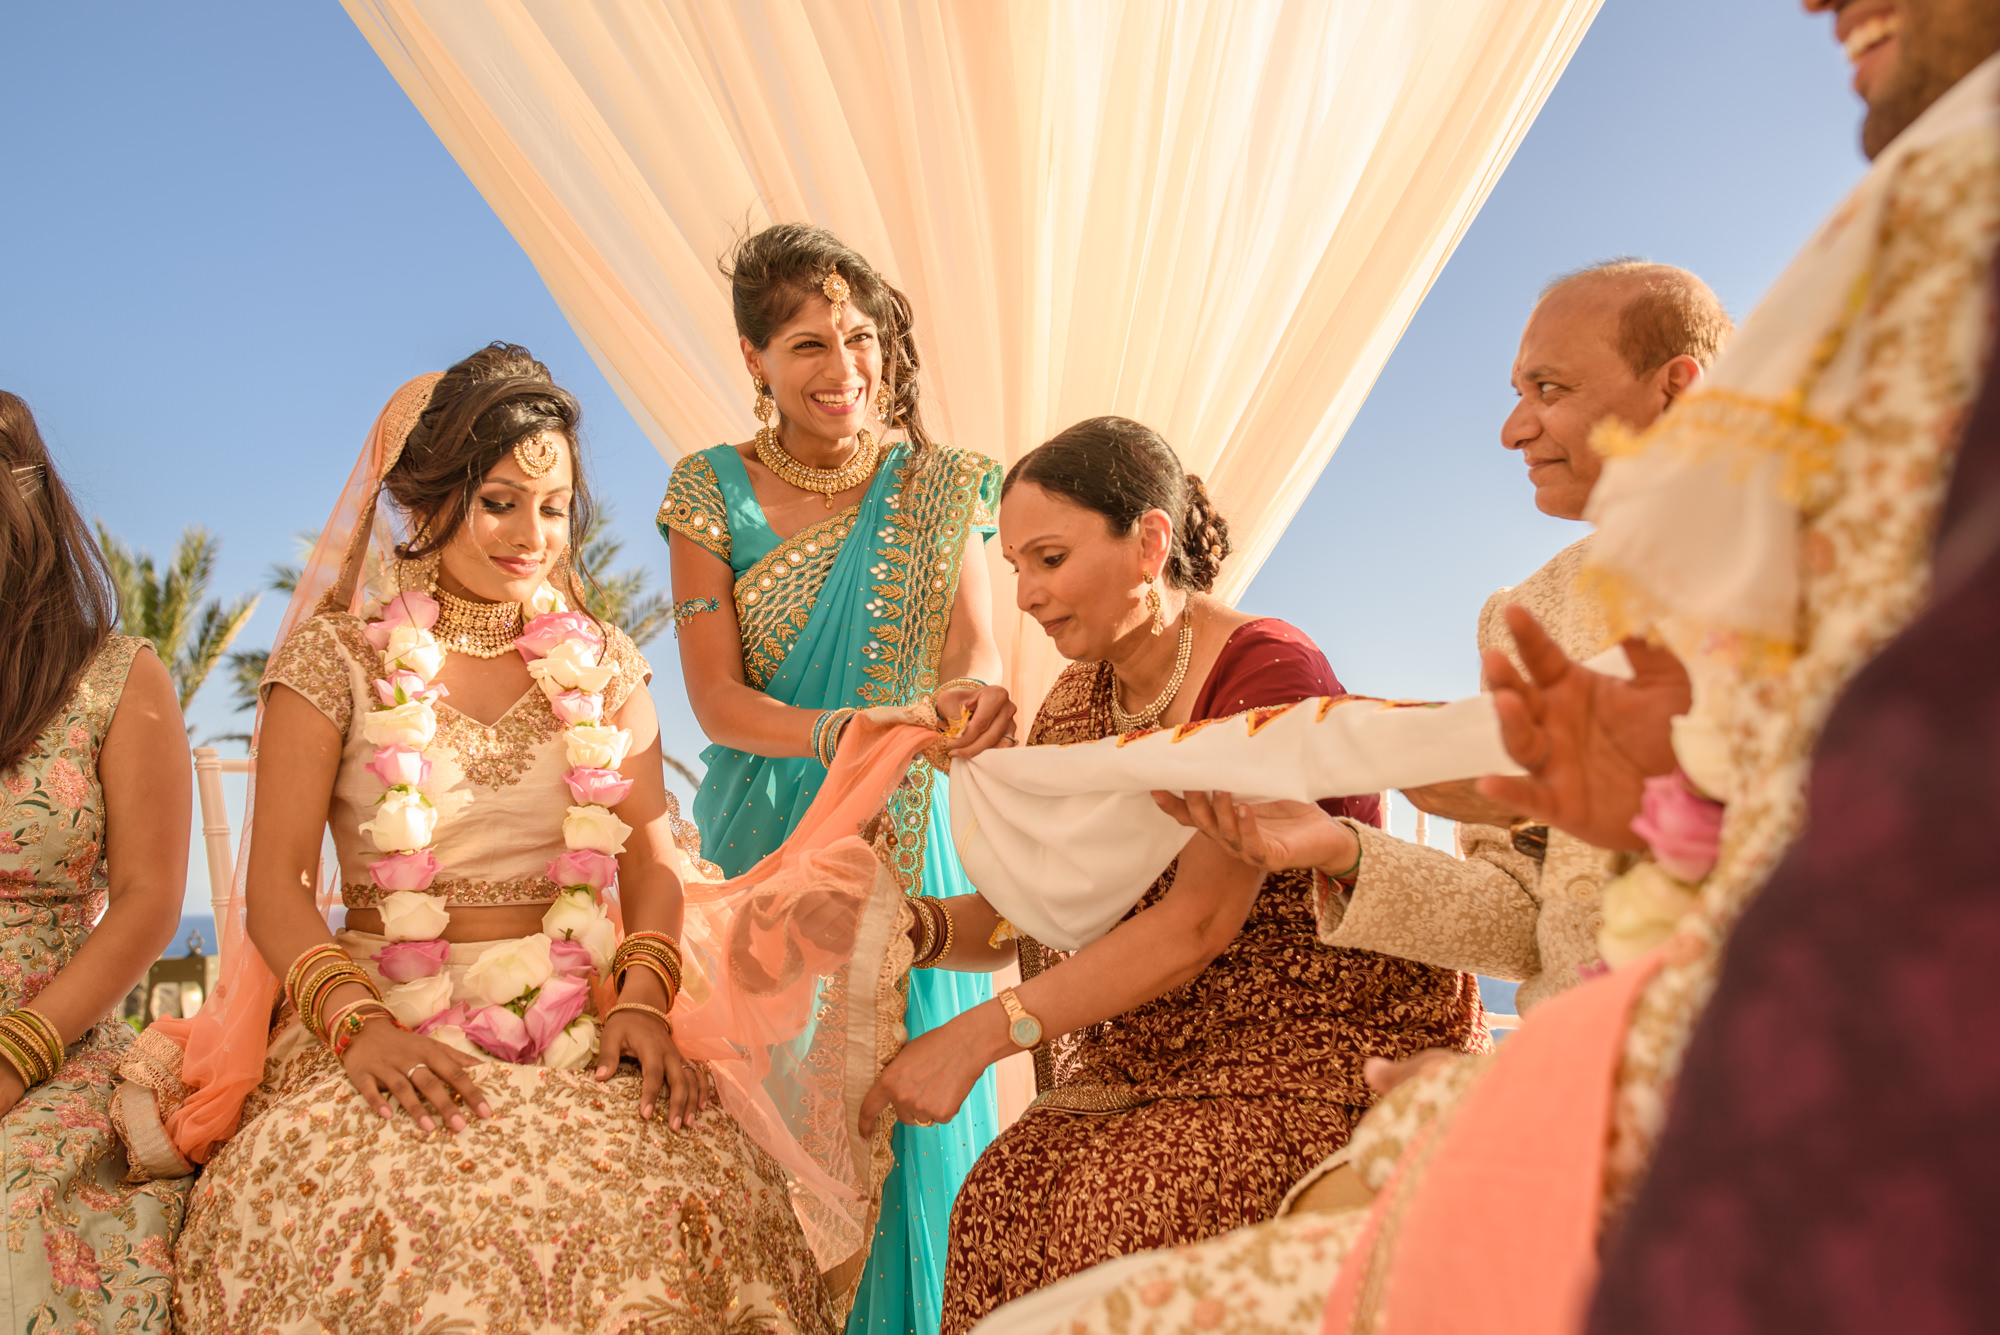 satnam photography wedding indian asian hindu destination wedding photographer tenerife ritz carlton abama-158.jpg